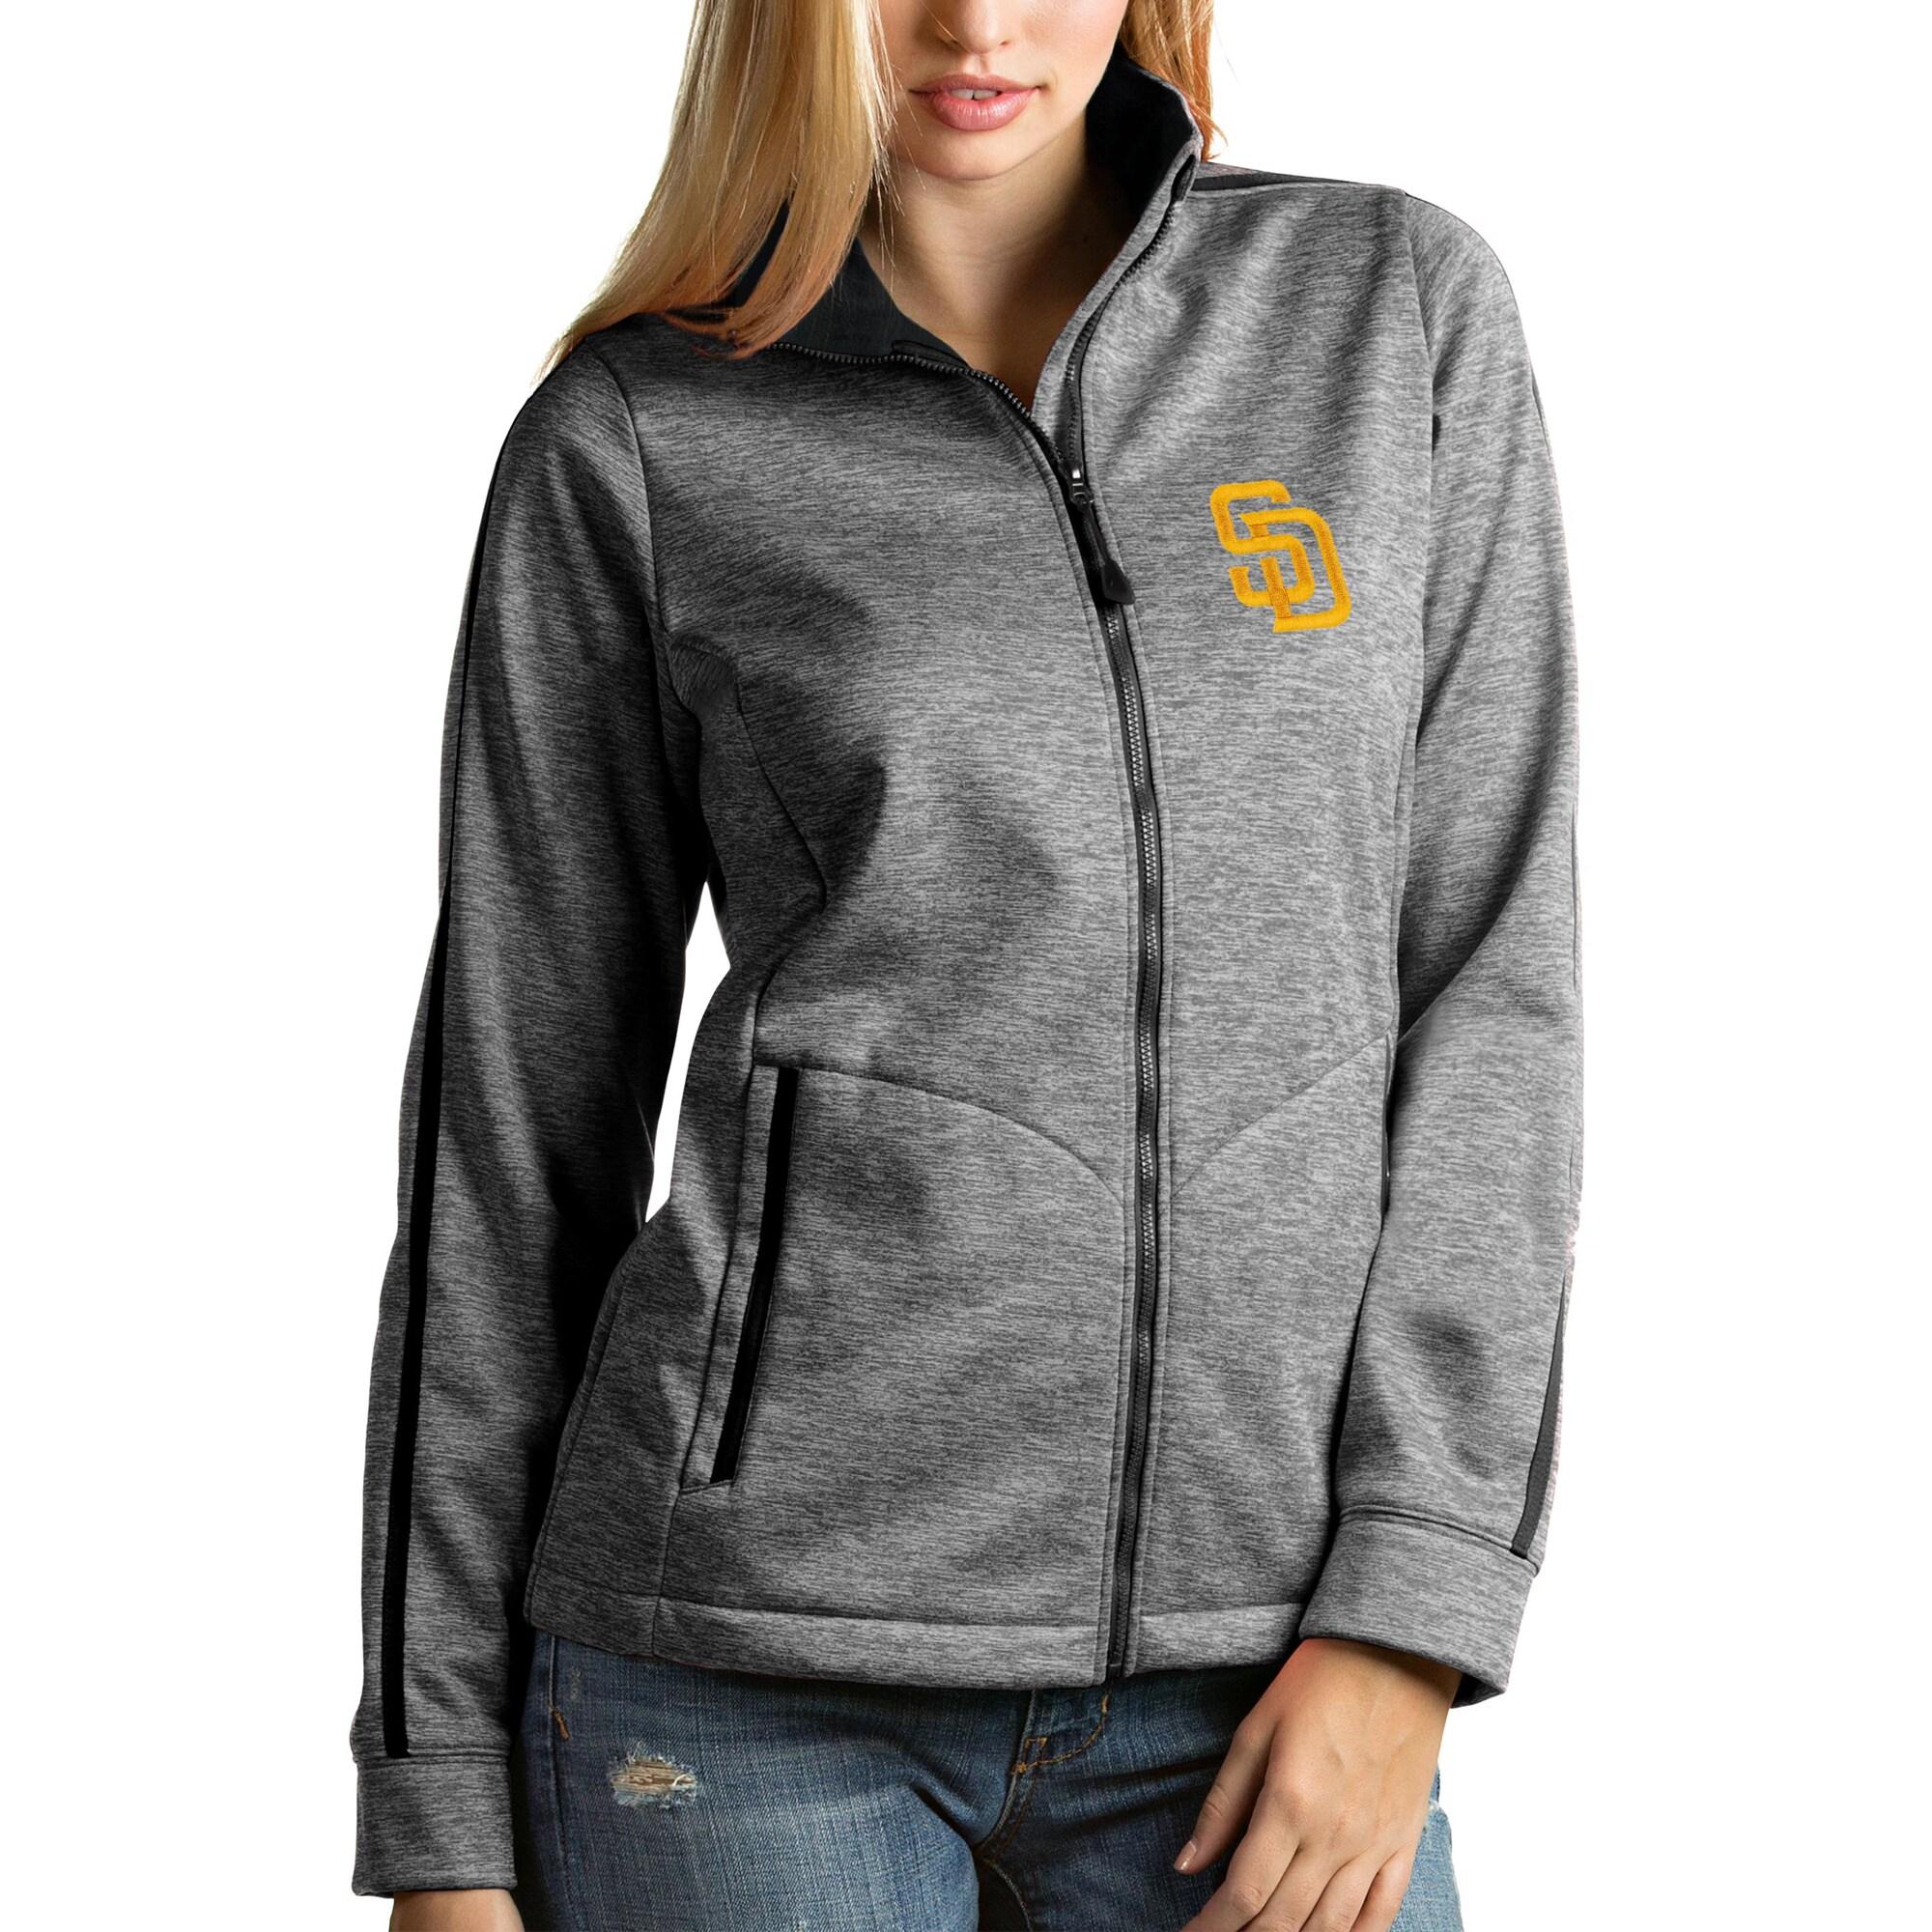 San Diego Padres Antigua Women's Full-Zip Golf Jacket - Heather Black